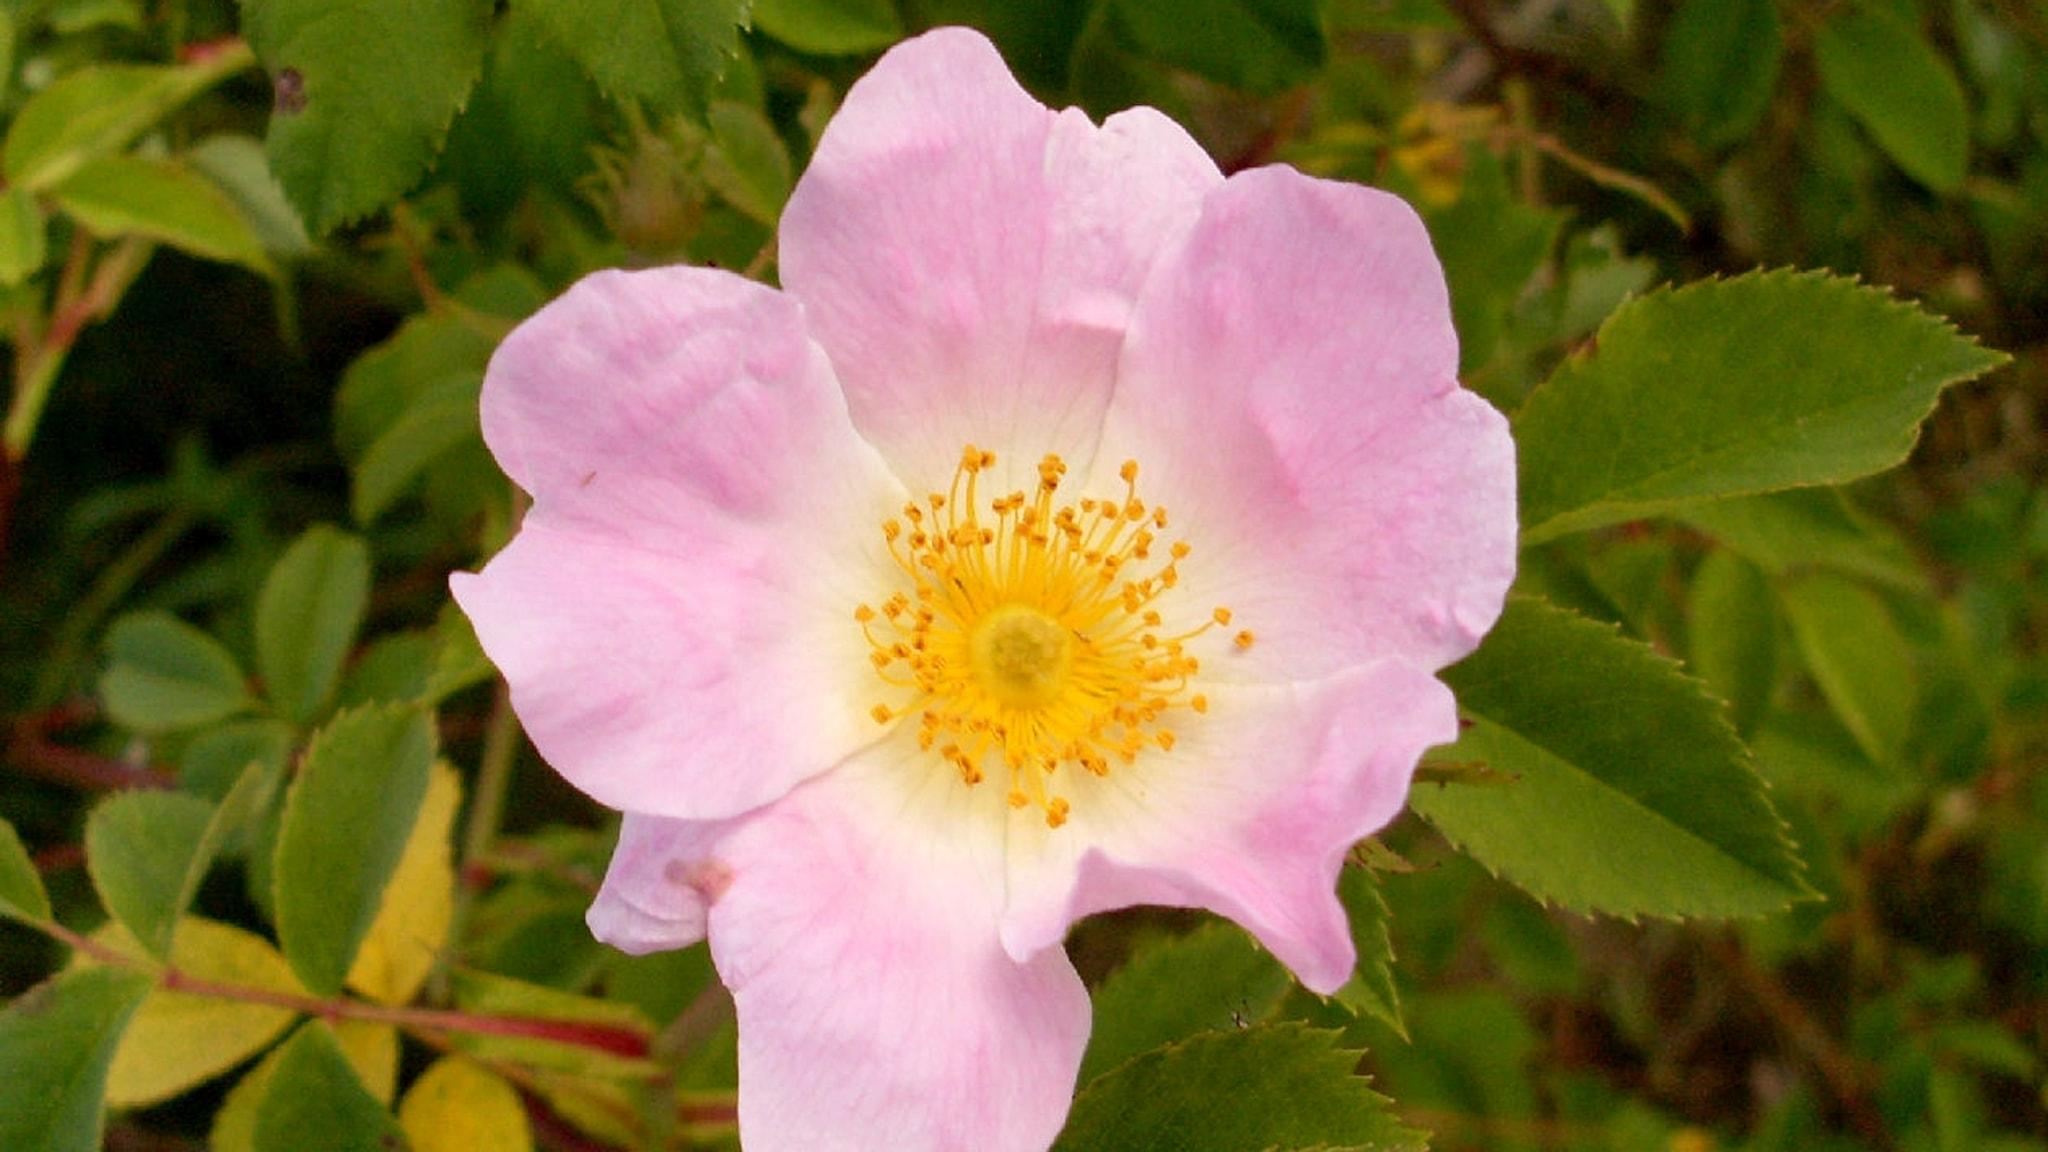 Berits blommor #1: Nyponros